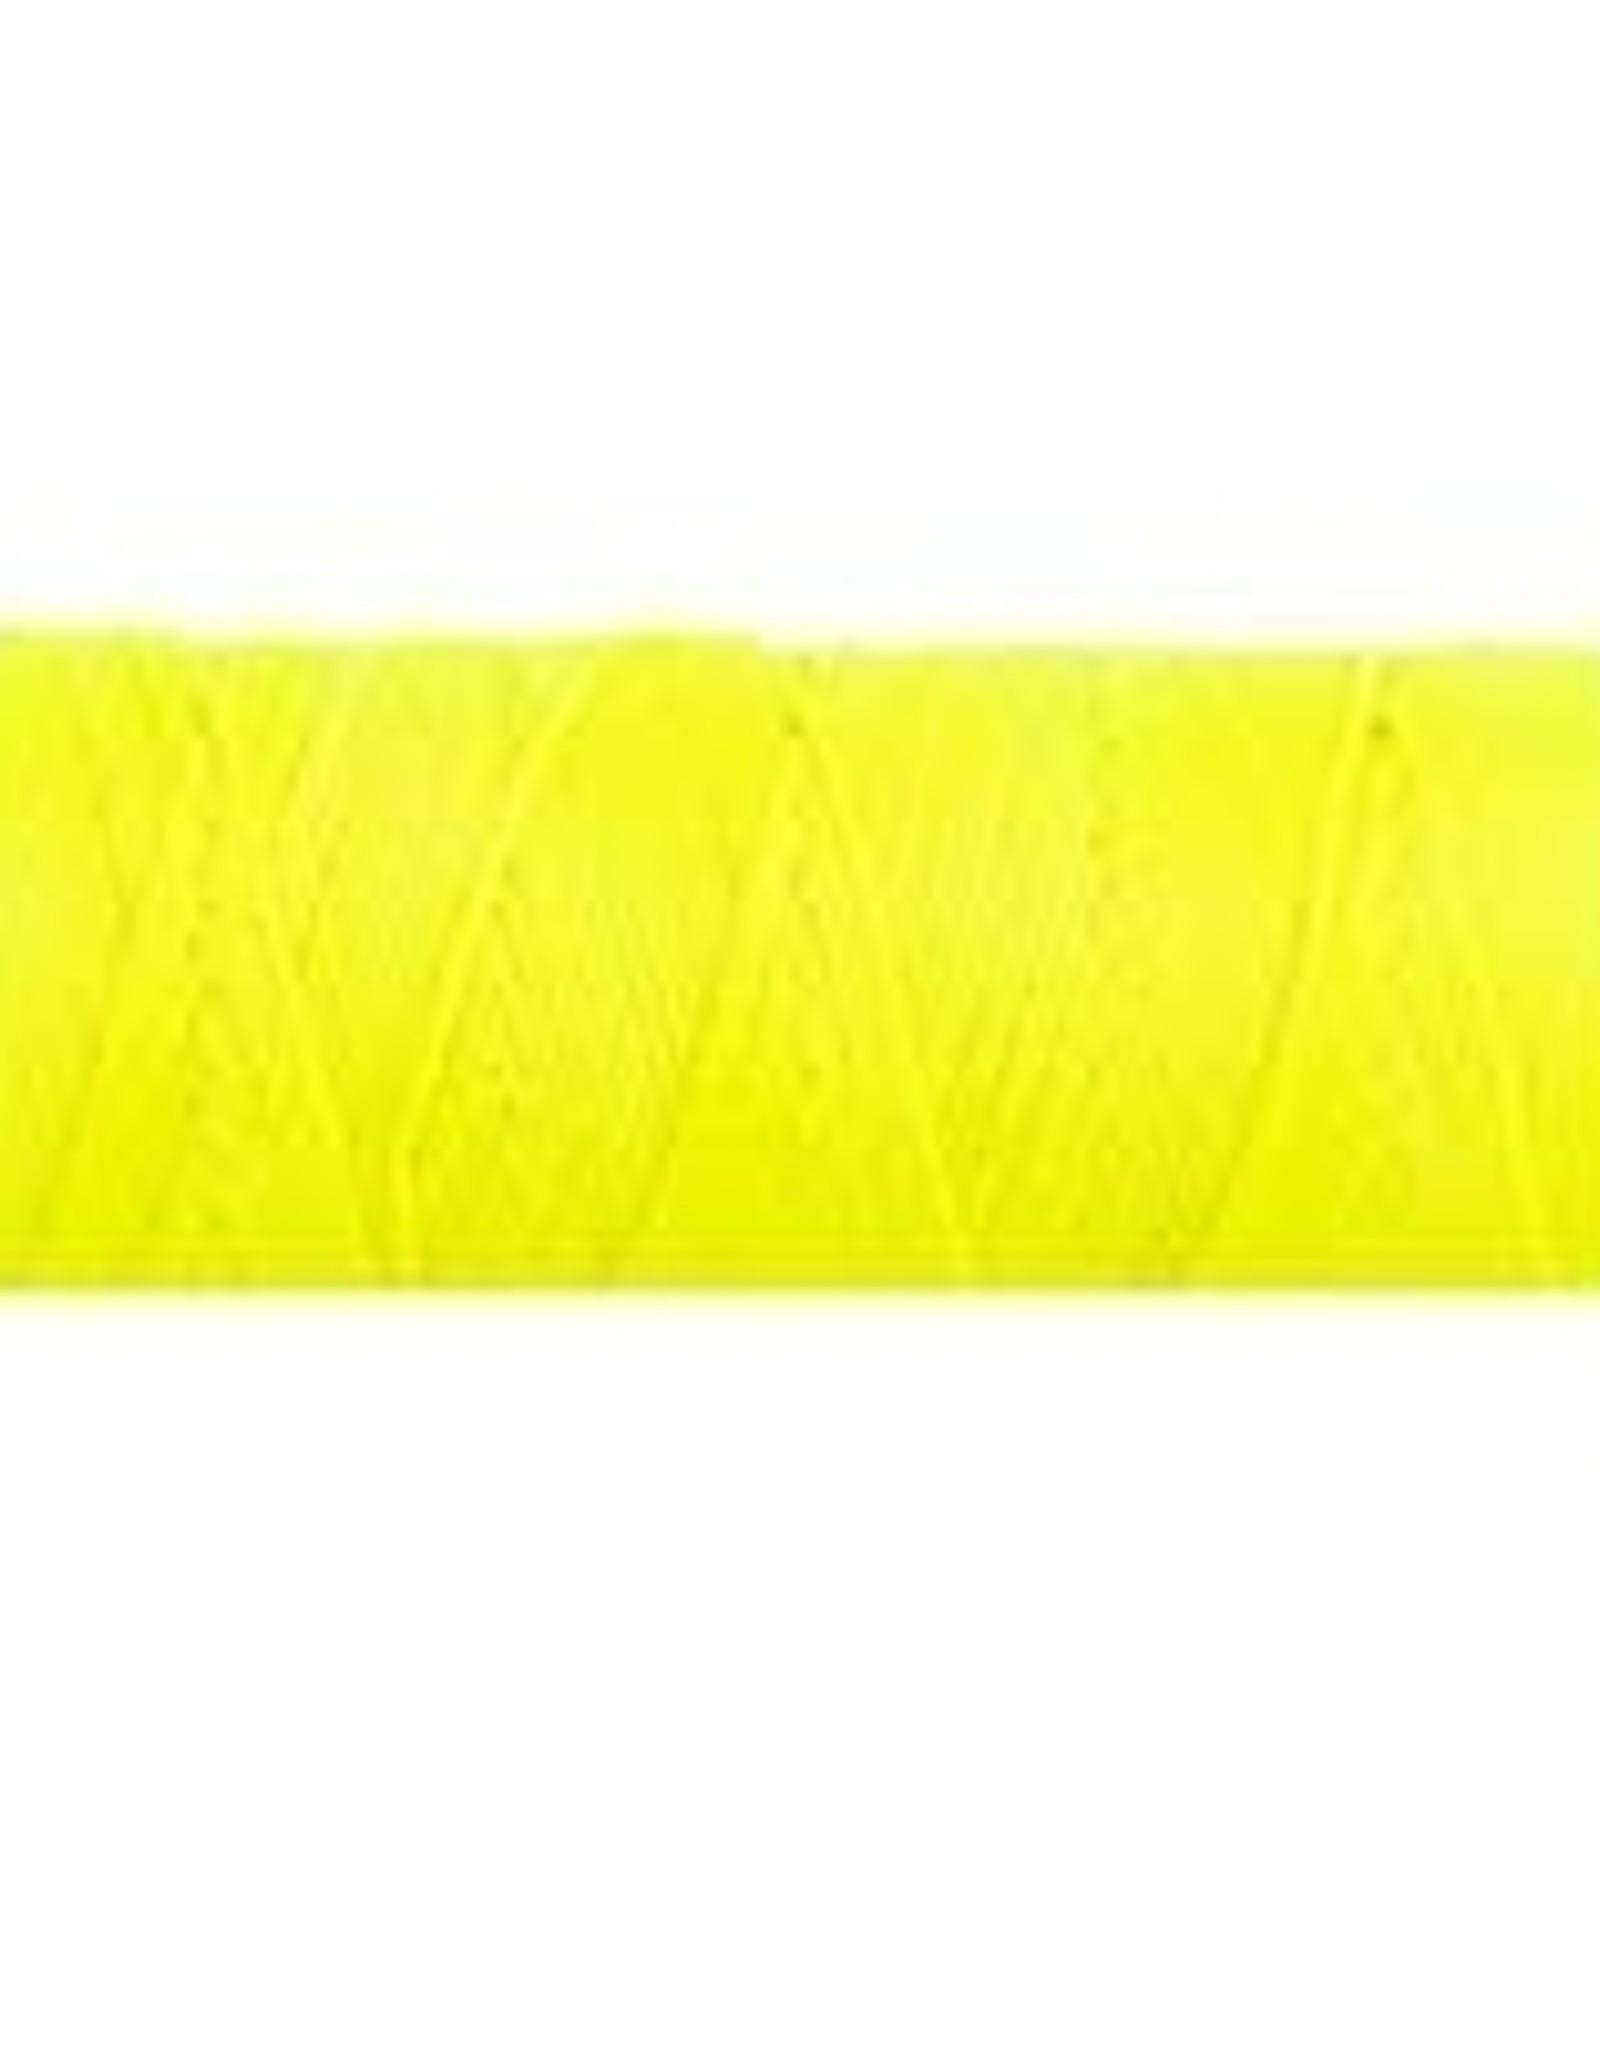 MJJ Brands Supramax Twine 170 lb Test / #18 x 525' / 160 m - Glow Yellow